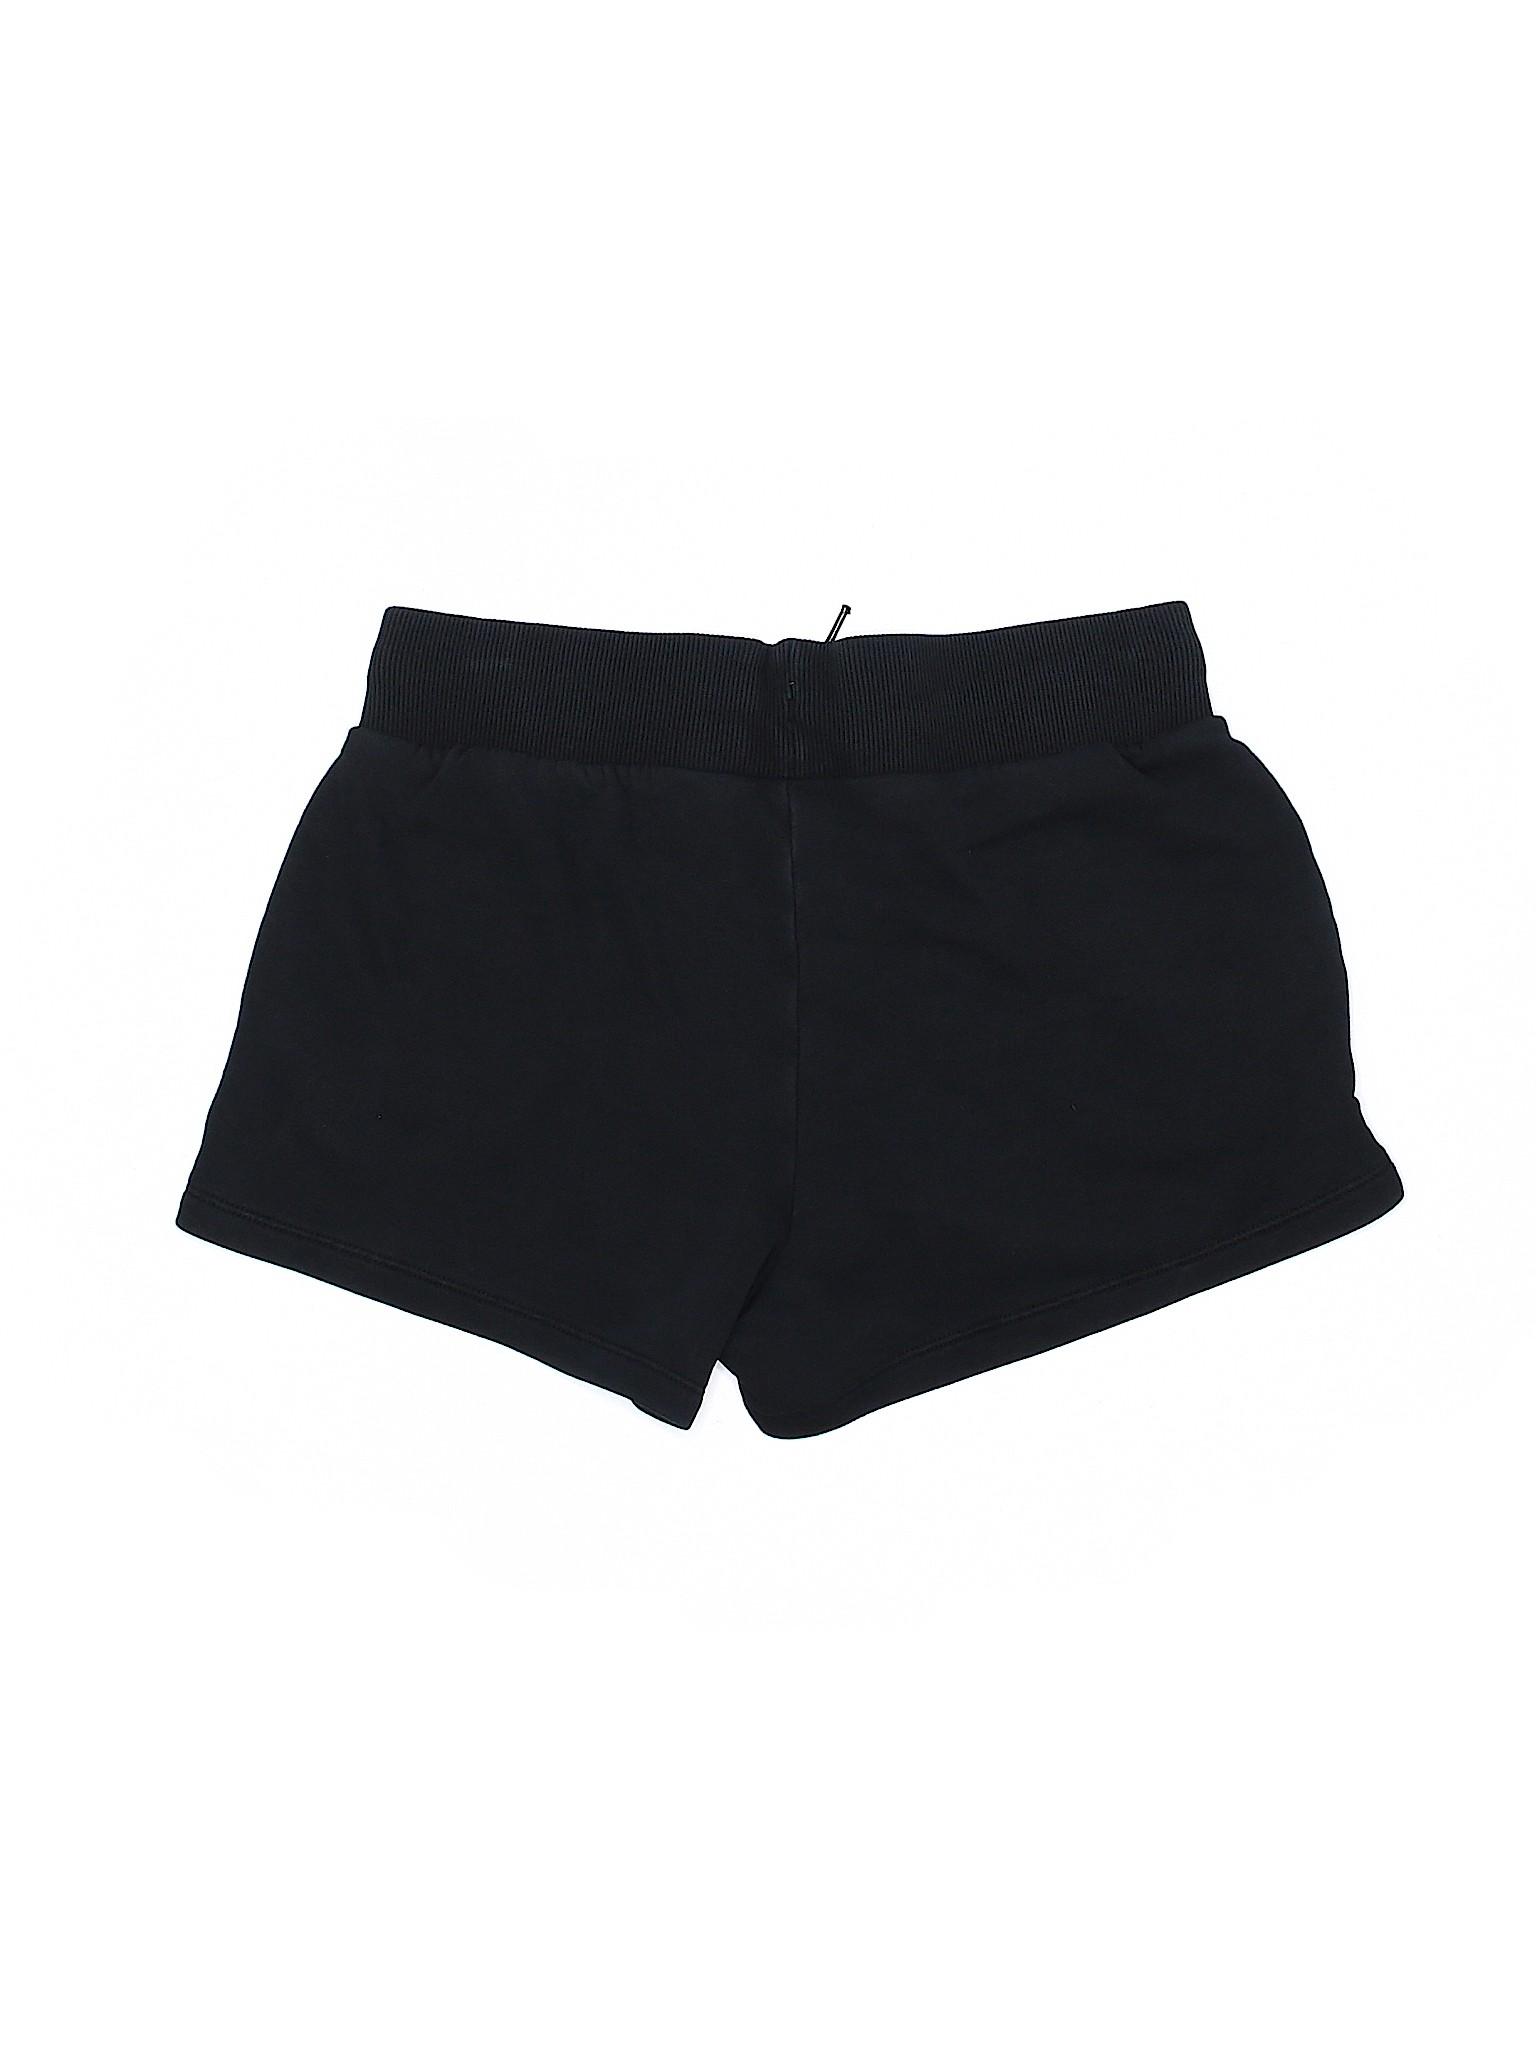 Boutique Boutique Shorts Puma Puma rWr1S4n